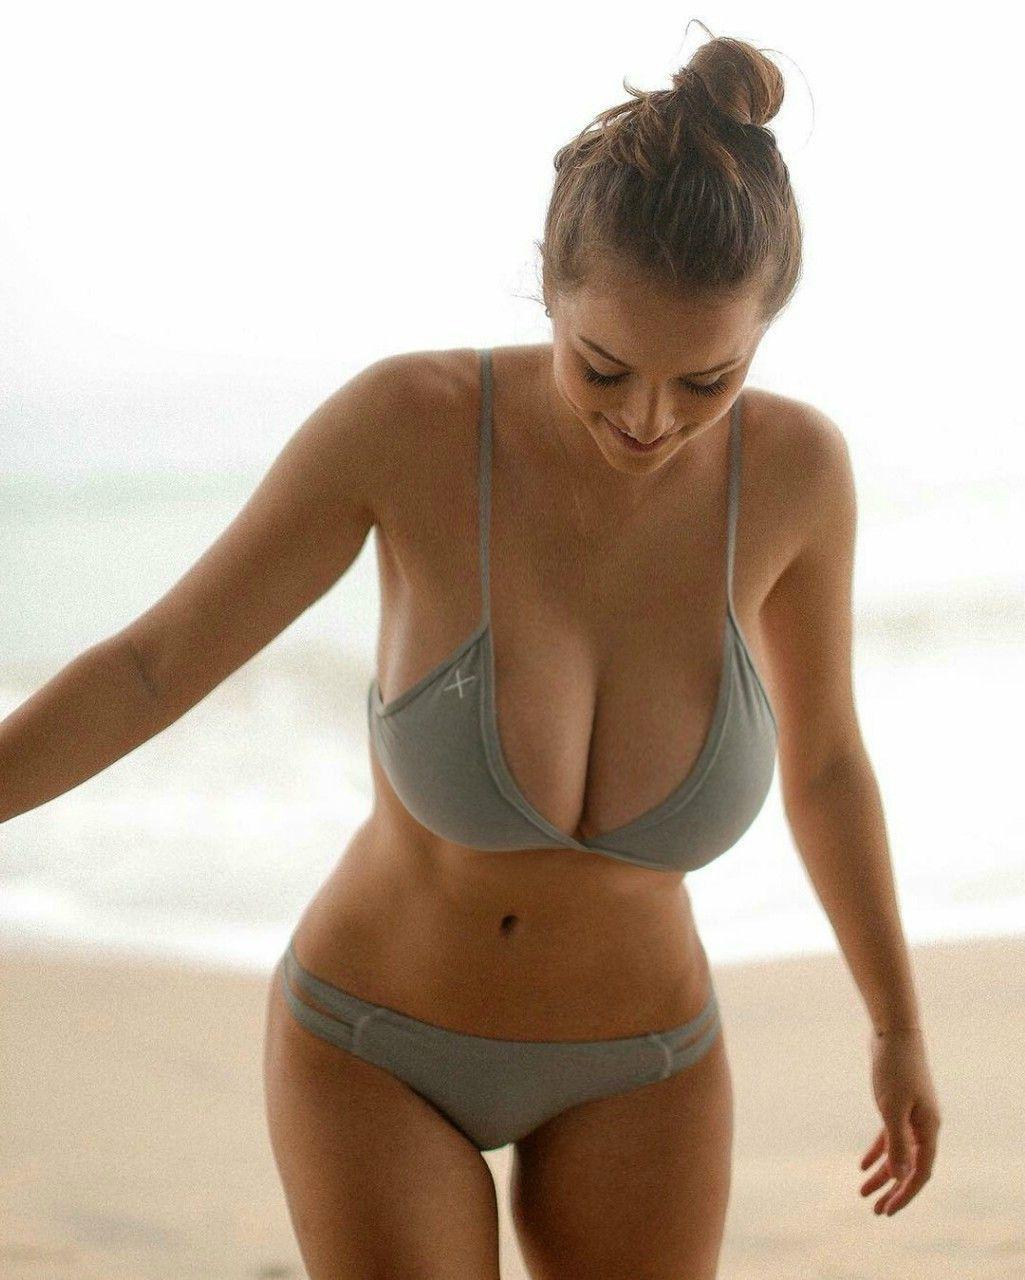 Newstar modell nip slip sunshine nackt